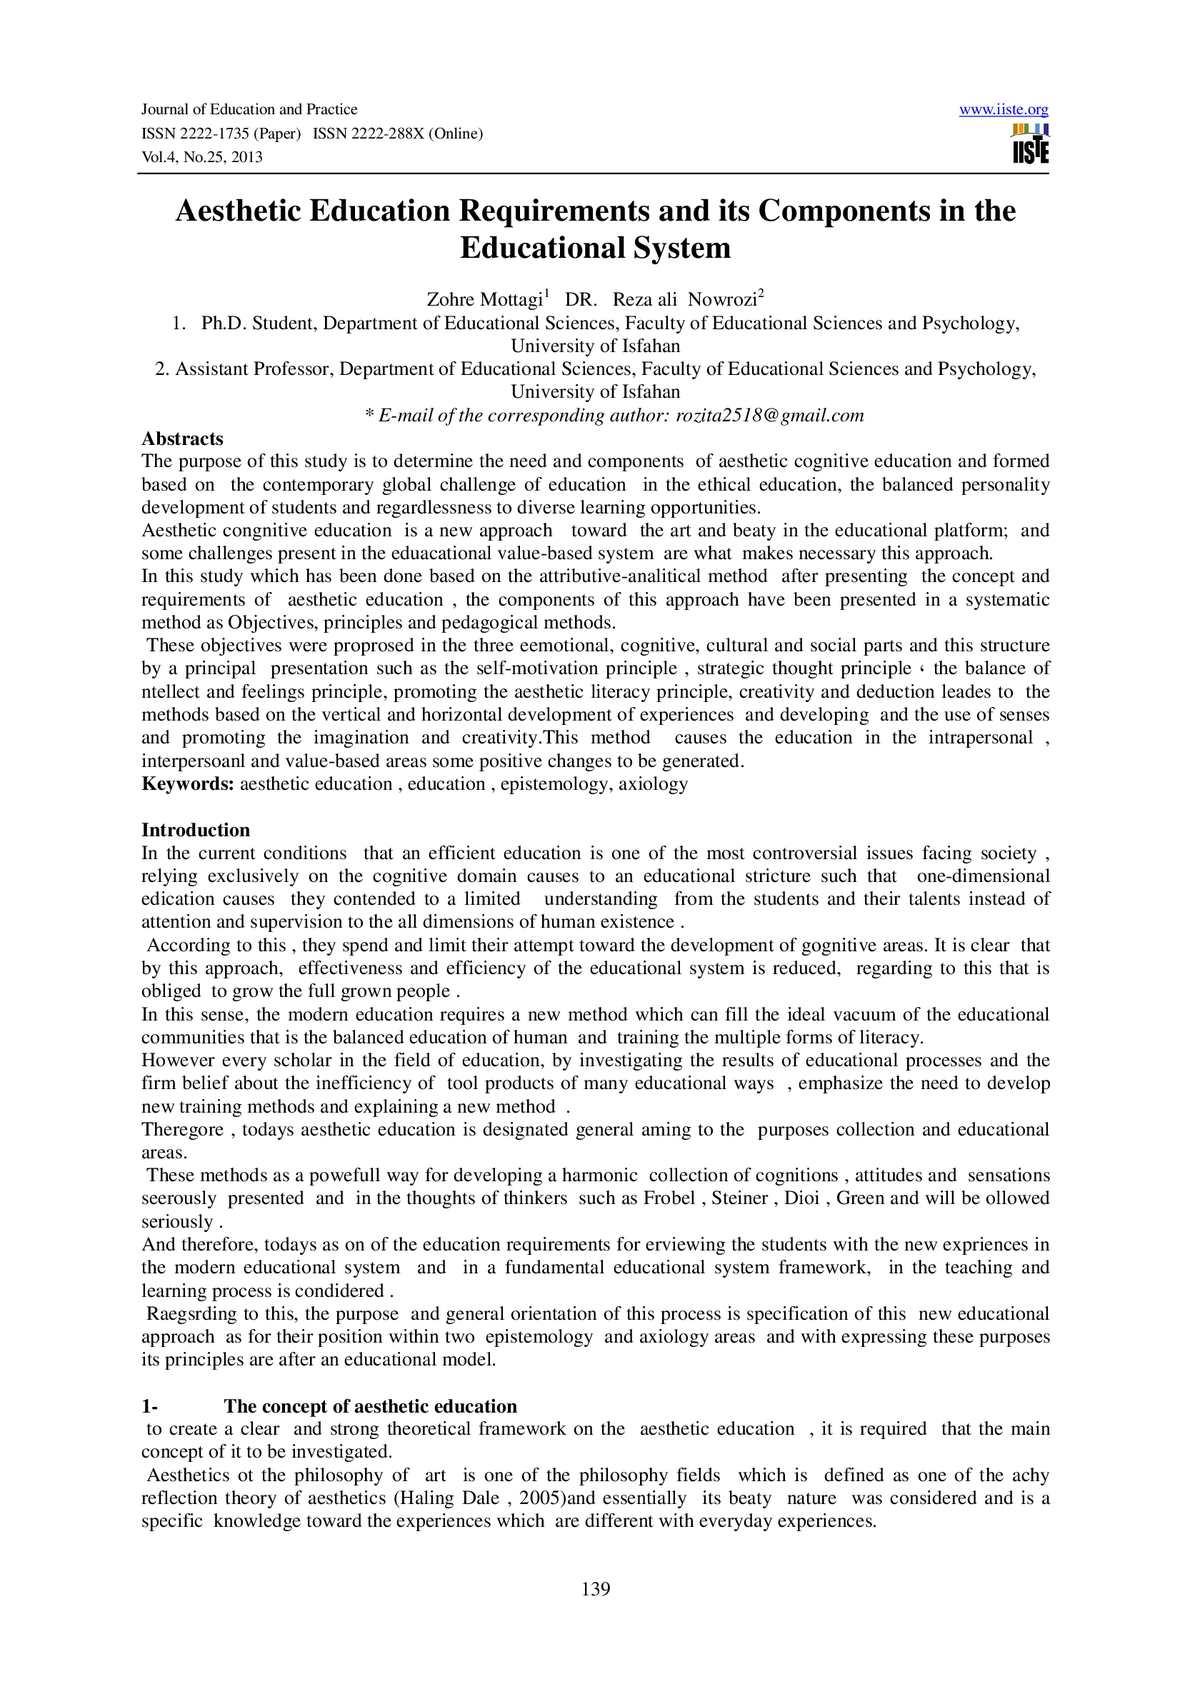 calamà o reflective essay ideas some club resignation letter